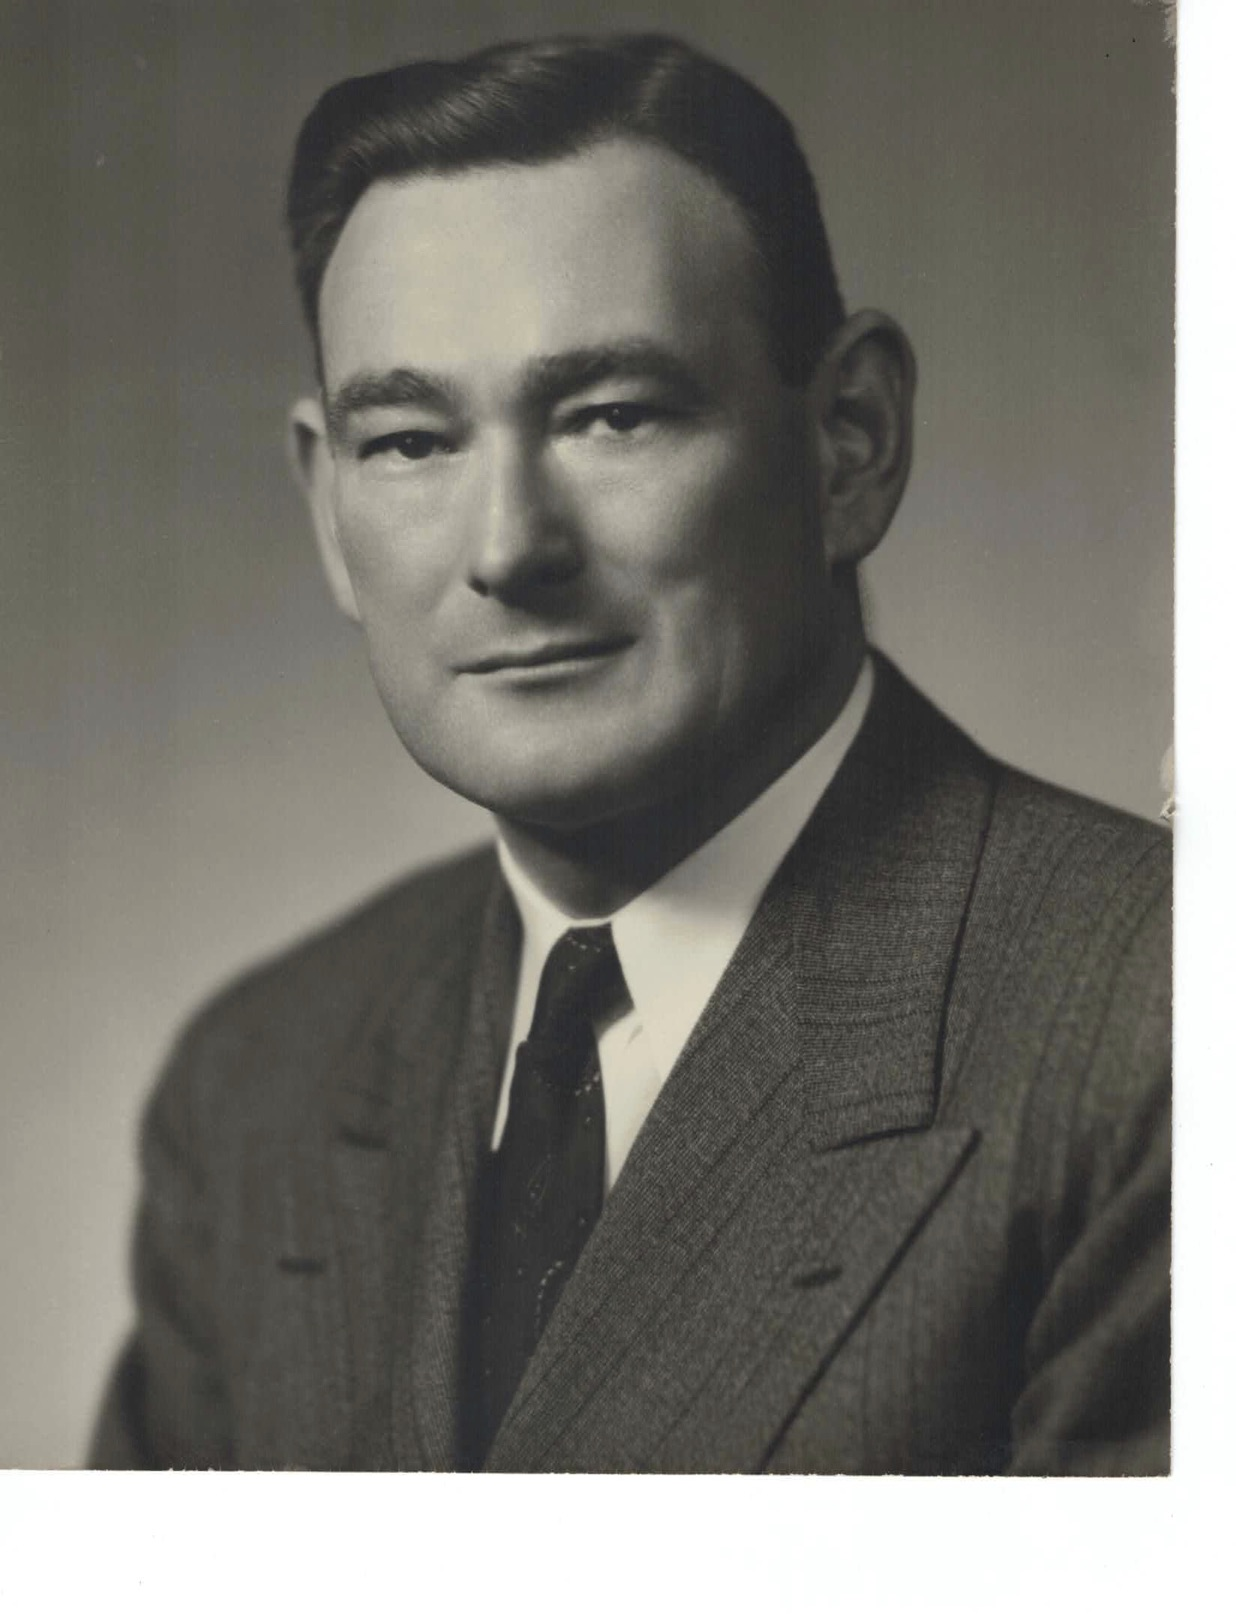 H. MALCOLM GOODFELLOW 1938-39